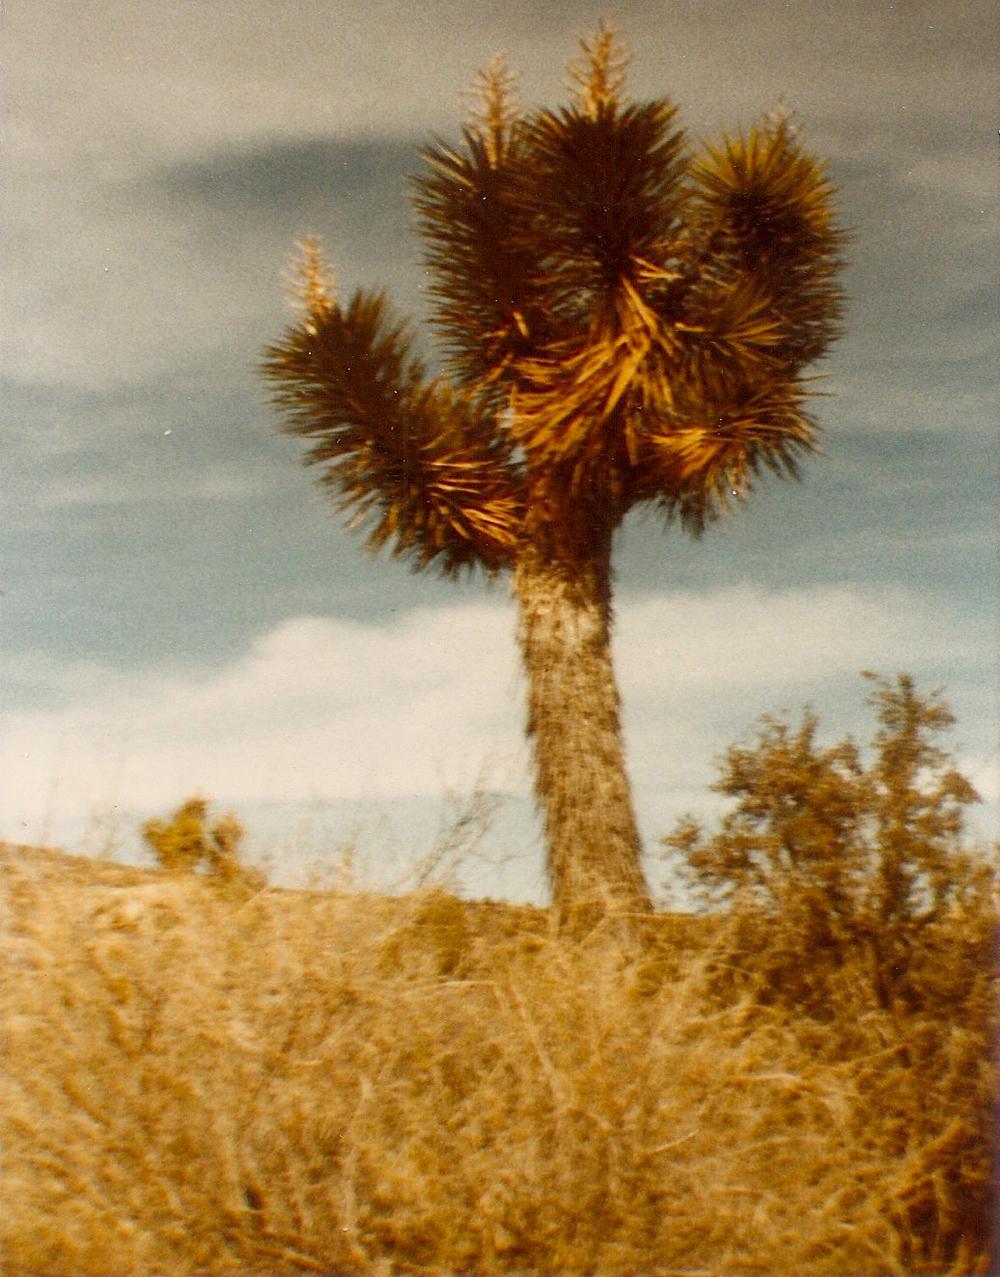 002-1950-j-tree.jpg